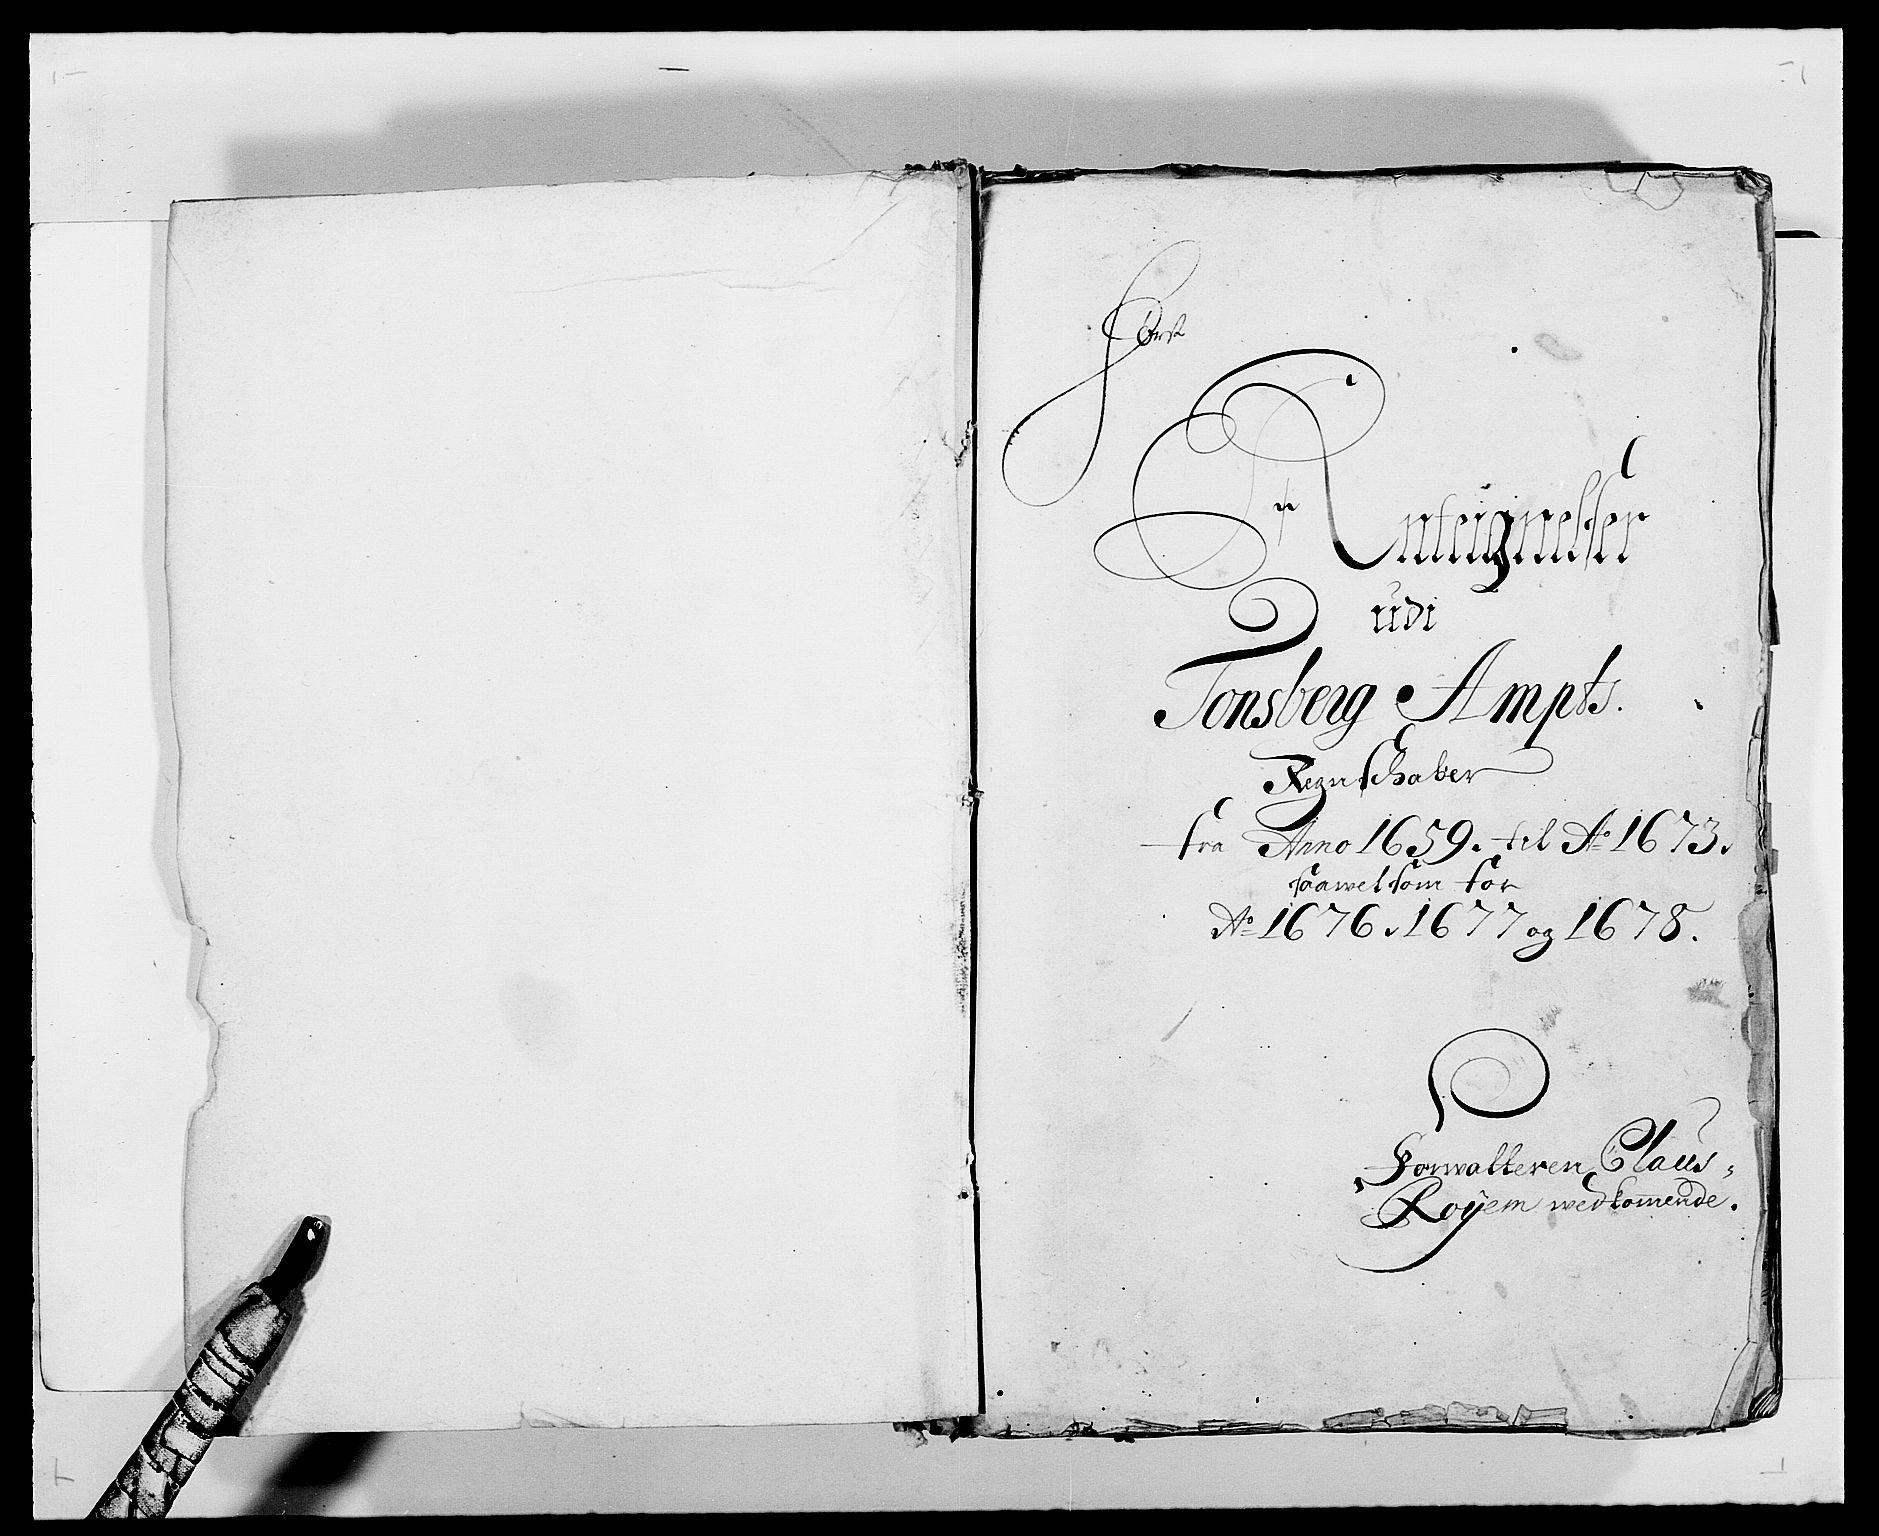 RA, Rentekammeret inntil 1814, Reviderte regnskaper, Fogderegnskap, R32/L1863: Fogderegnskap Jarlsberg grevskap, 1659-1687, s. 2